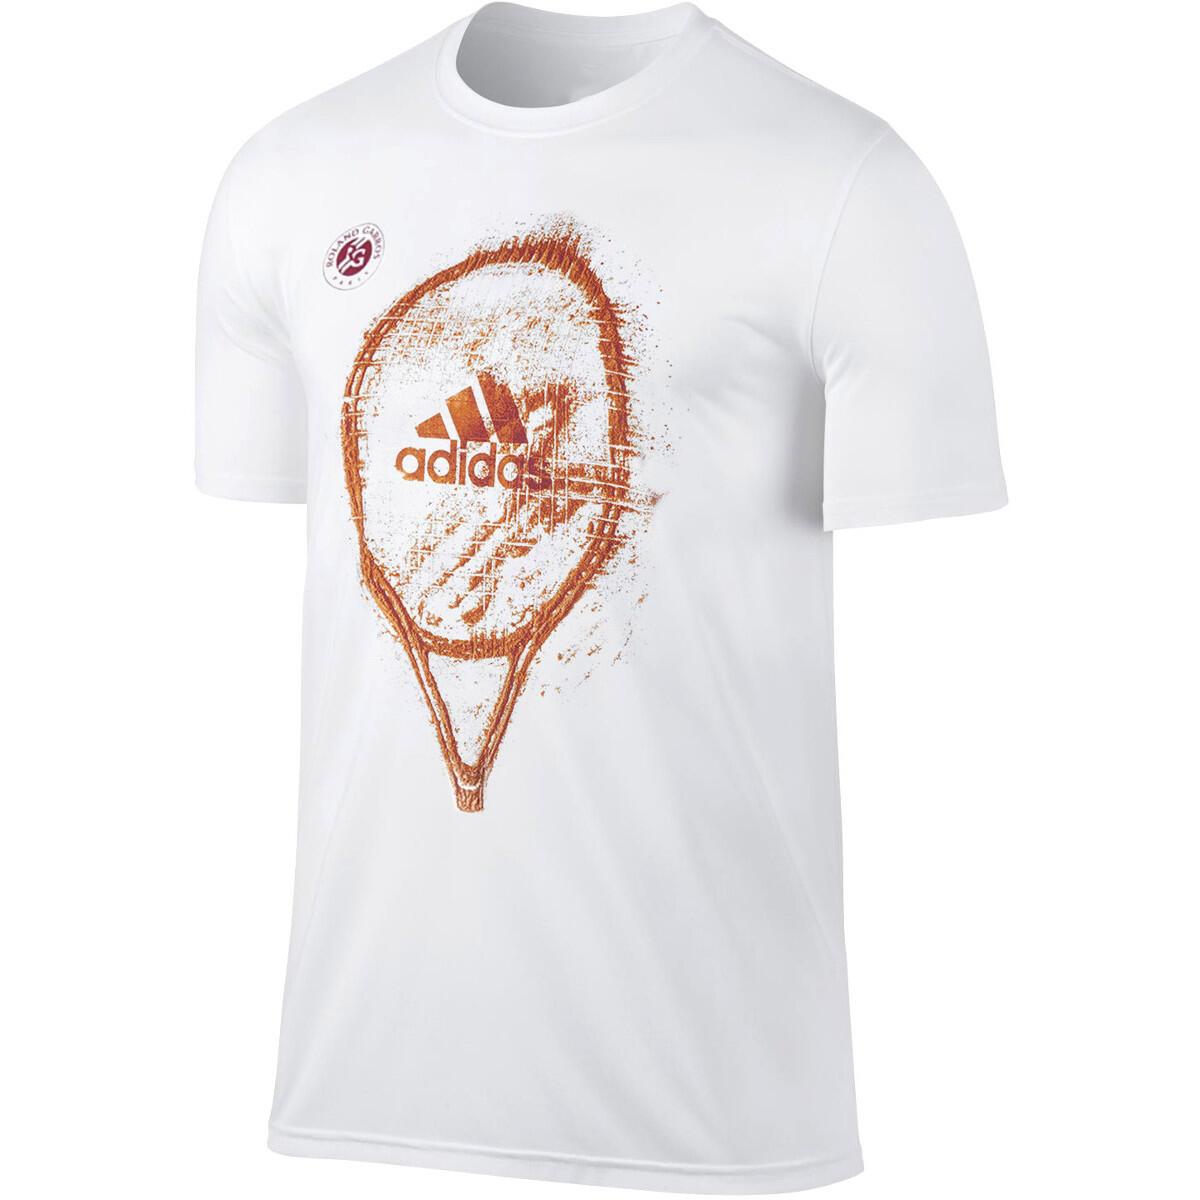 bq2547-adidas-roland-garros-men-s-tennis-t-shirt-white